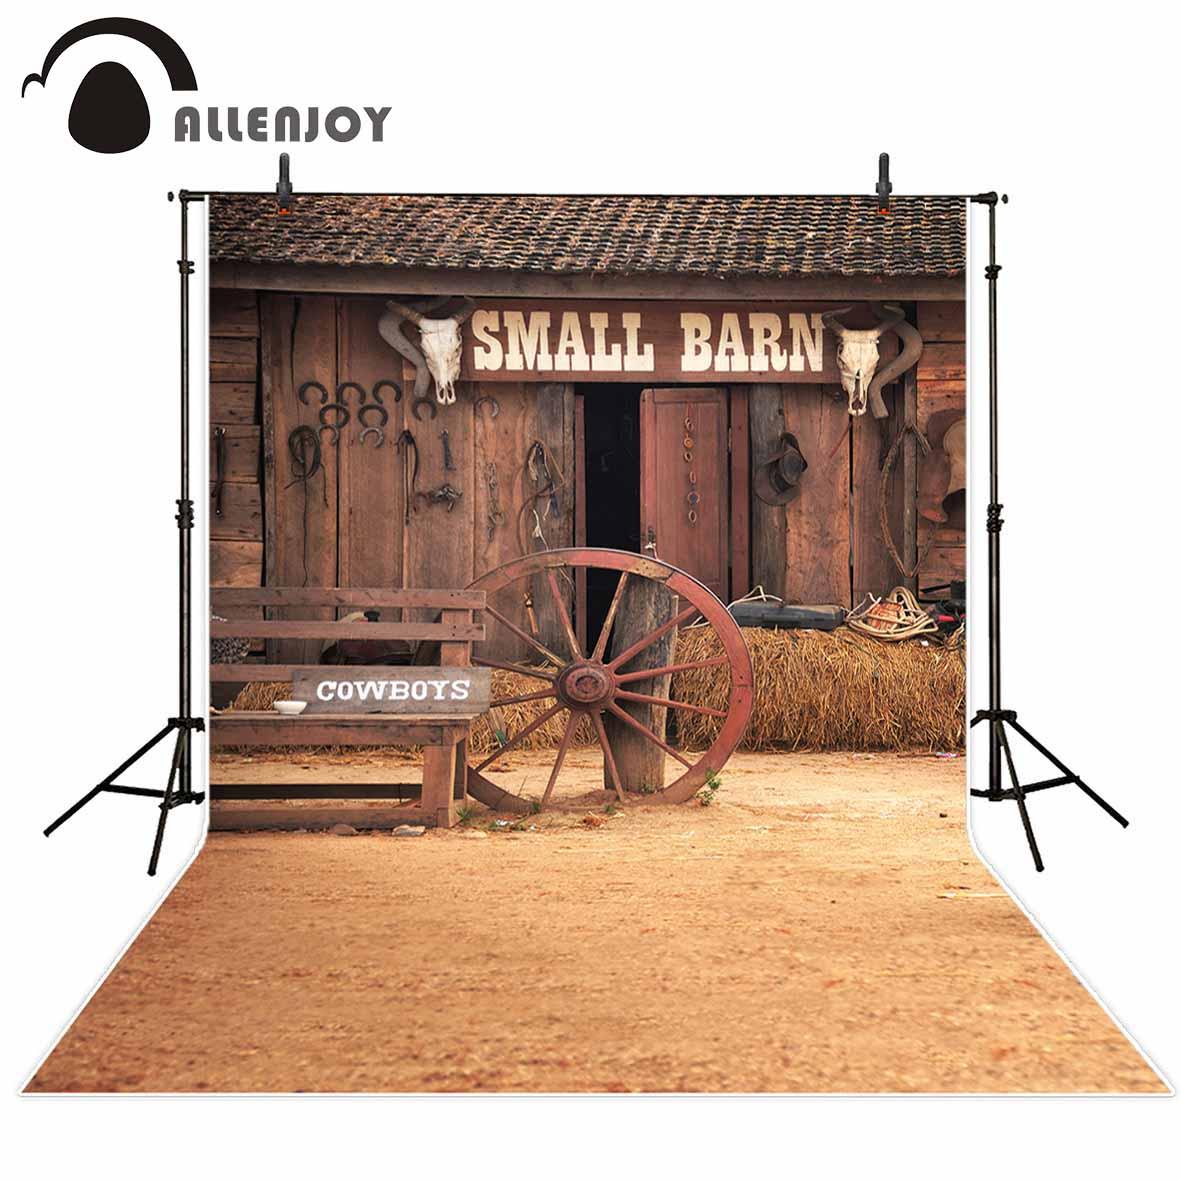 Allenjoy photo background wooden barn wheel cowboy straw vintage photographic background for photo studio photocall vinyl cloth